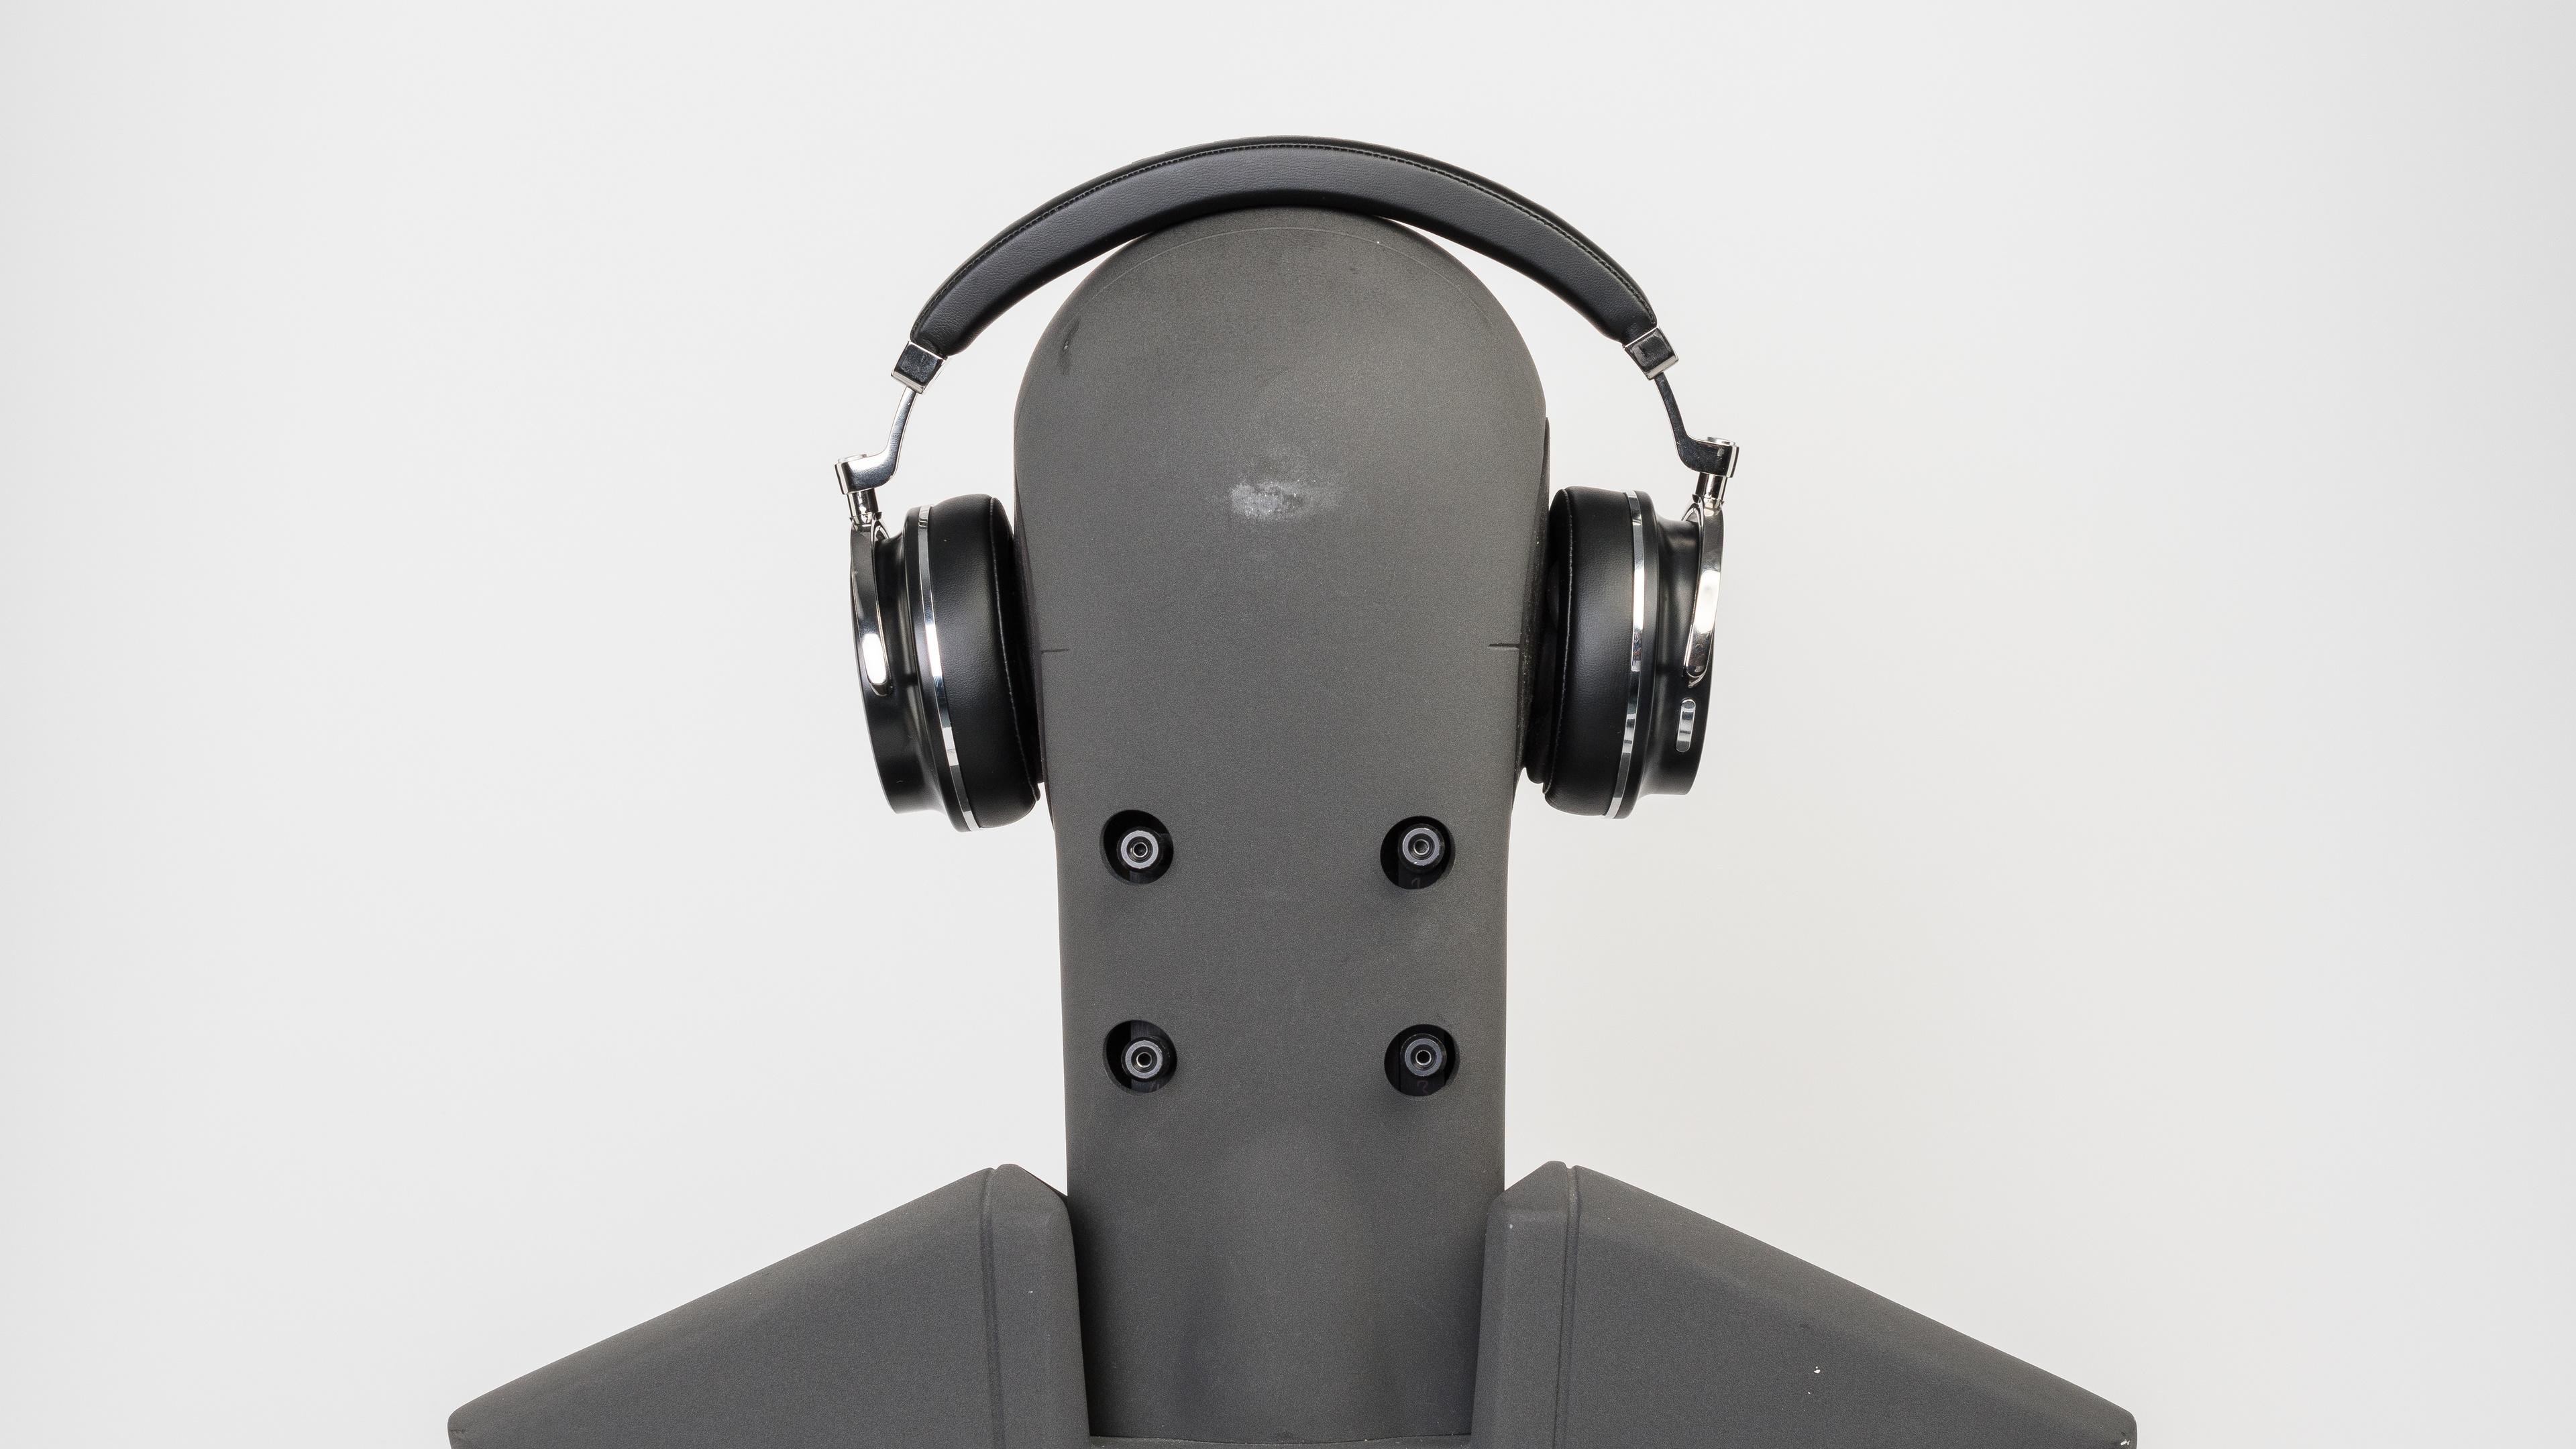 archeer ah07 bluetooth wireless headphones